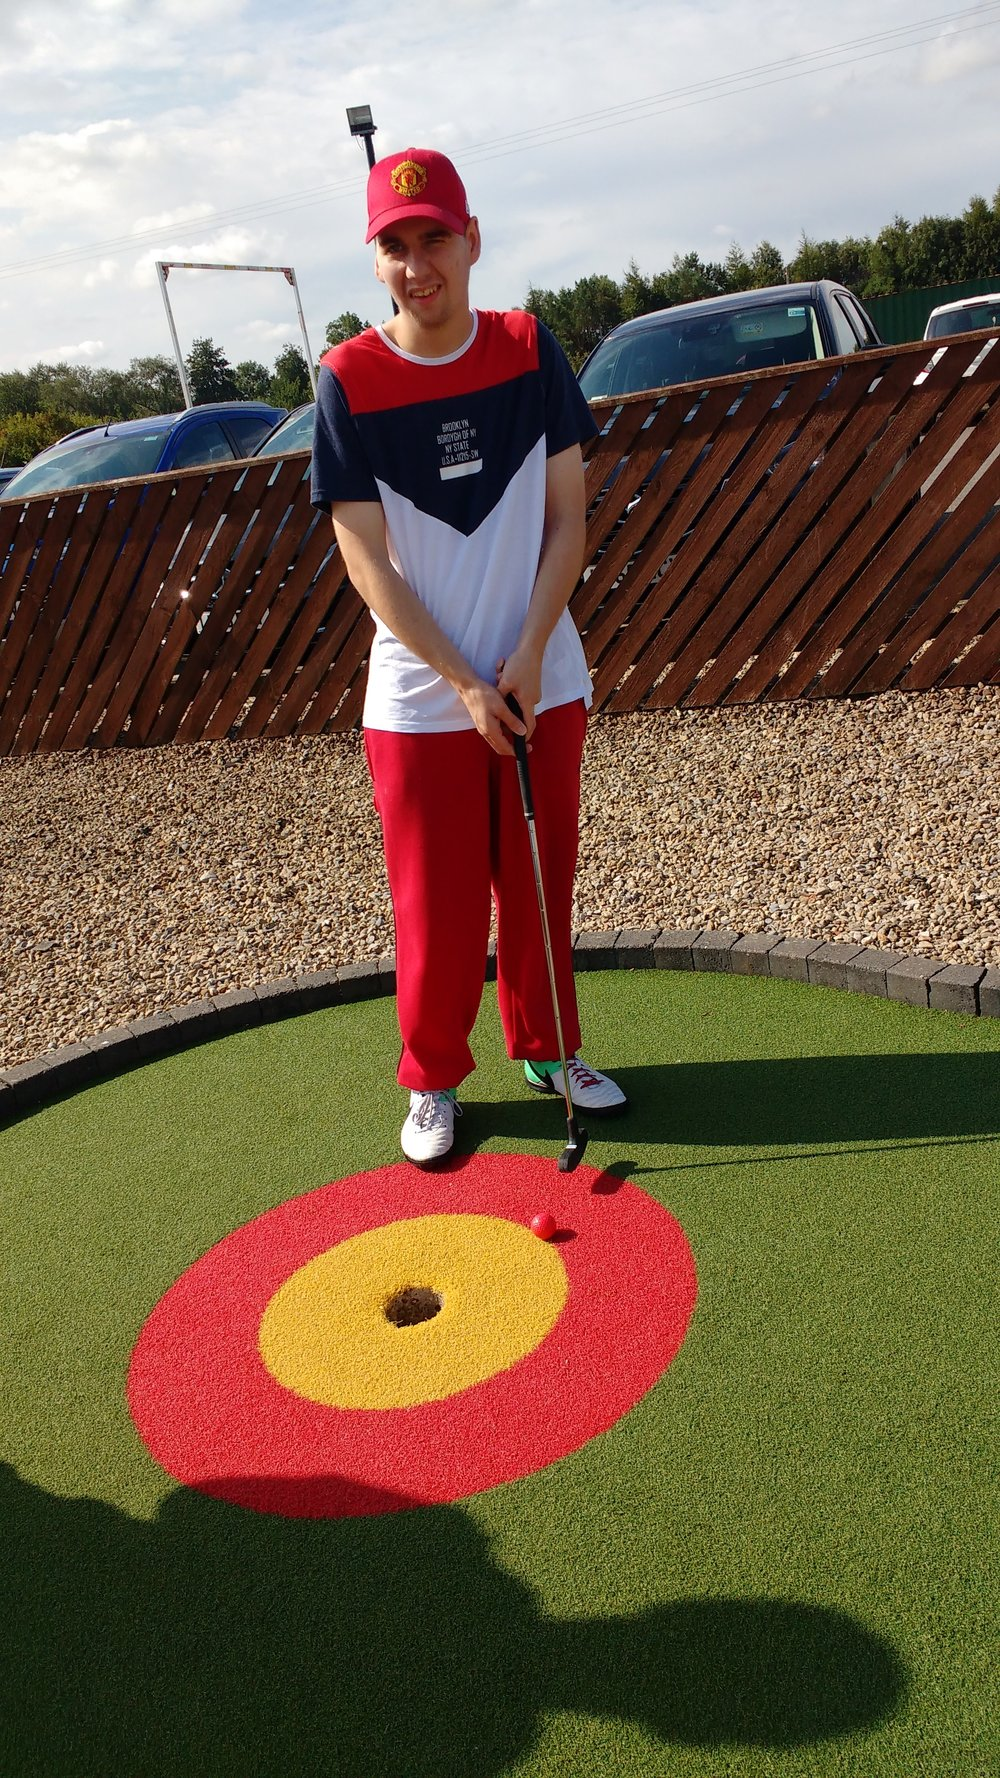 Nathan golf2.jpg